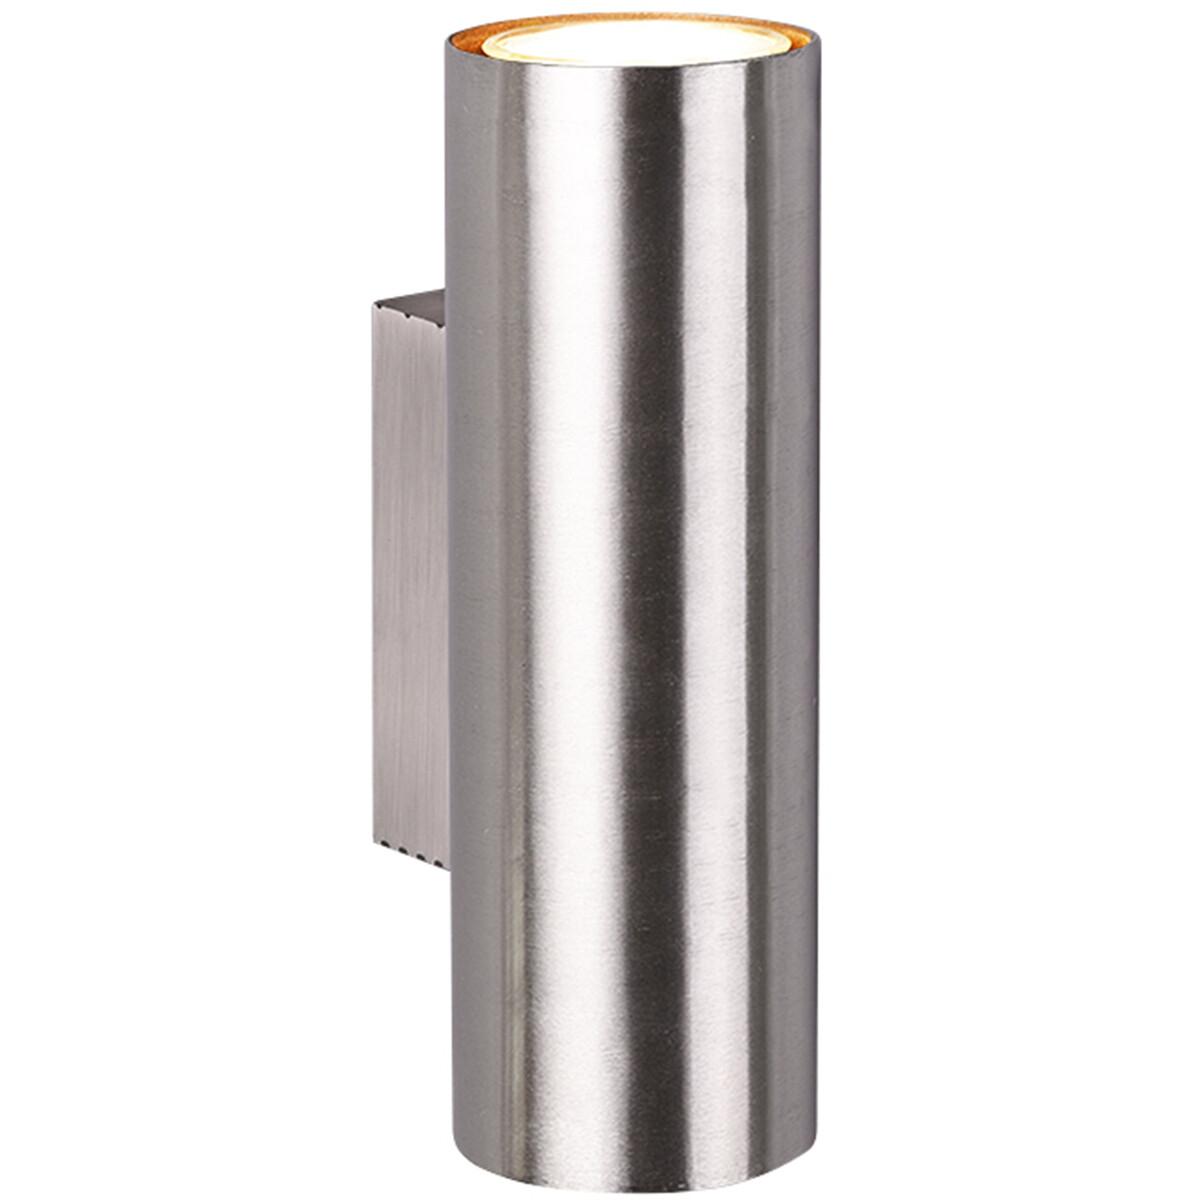 LED Wandlamp - Trion Mary - GU10 Fitting - Rond - Mat Nikkel - Aluminium